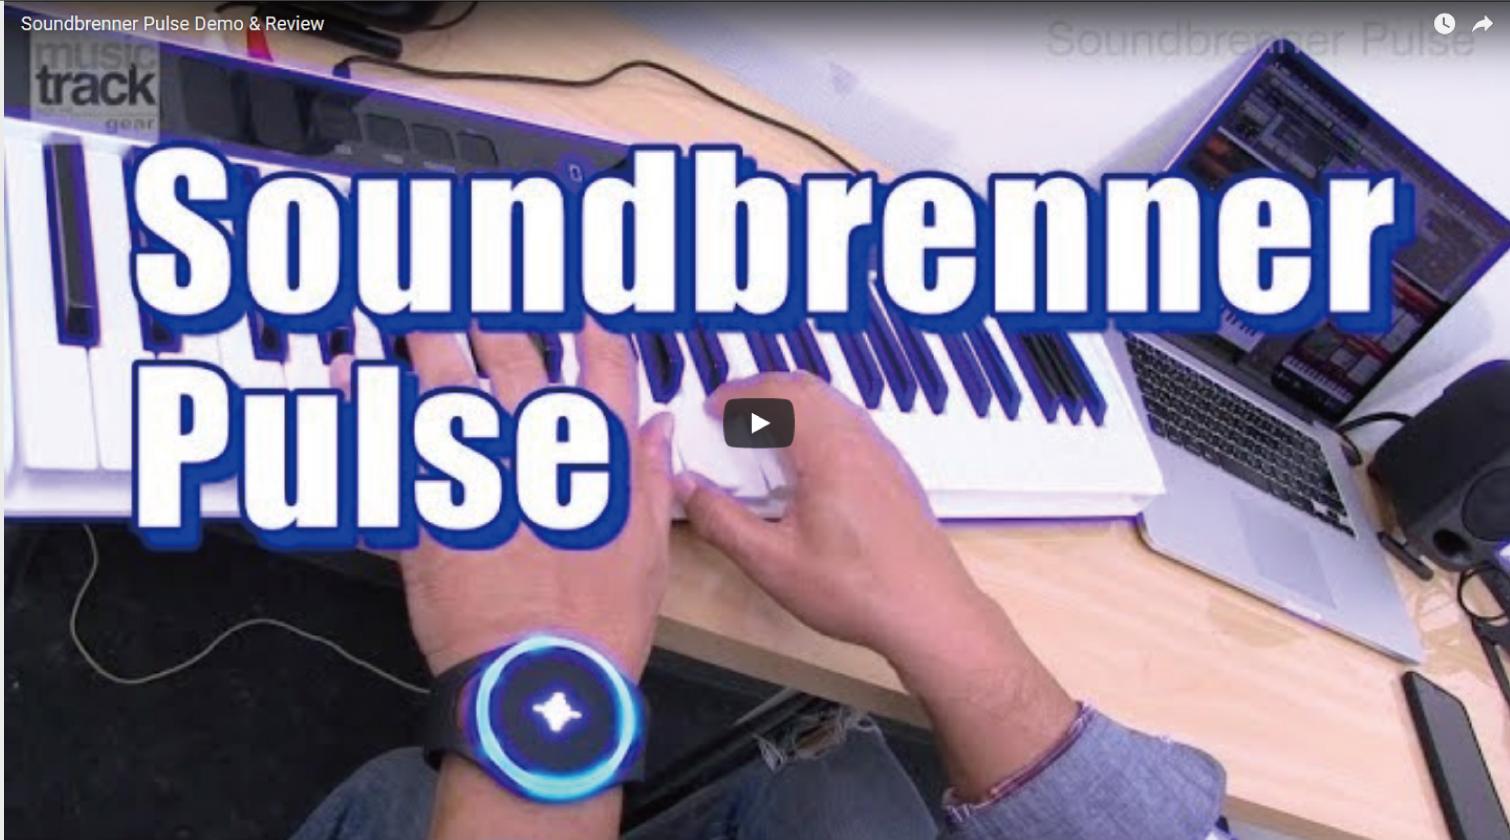 【Soundbrenner】非常に多くのチャンネル登録者を持つMusictrack様より Soundbrenner Pulseに関する動画レビューを掲載いただきました!